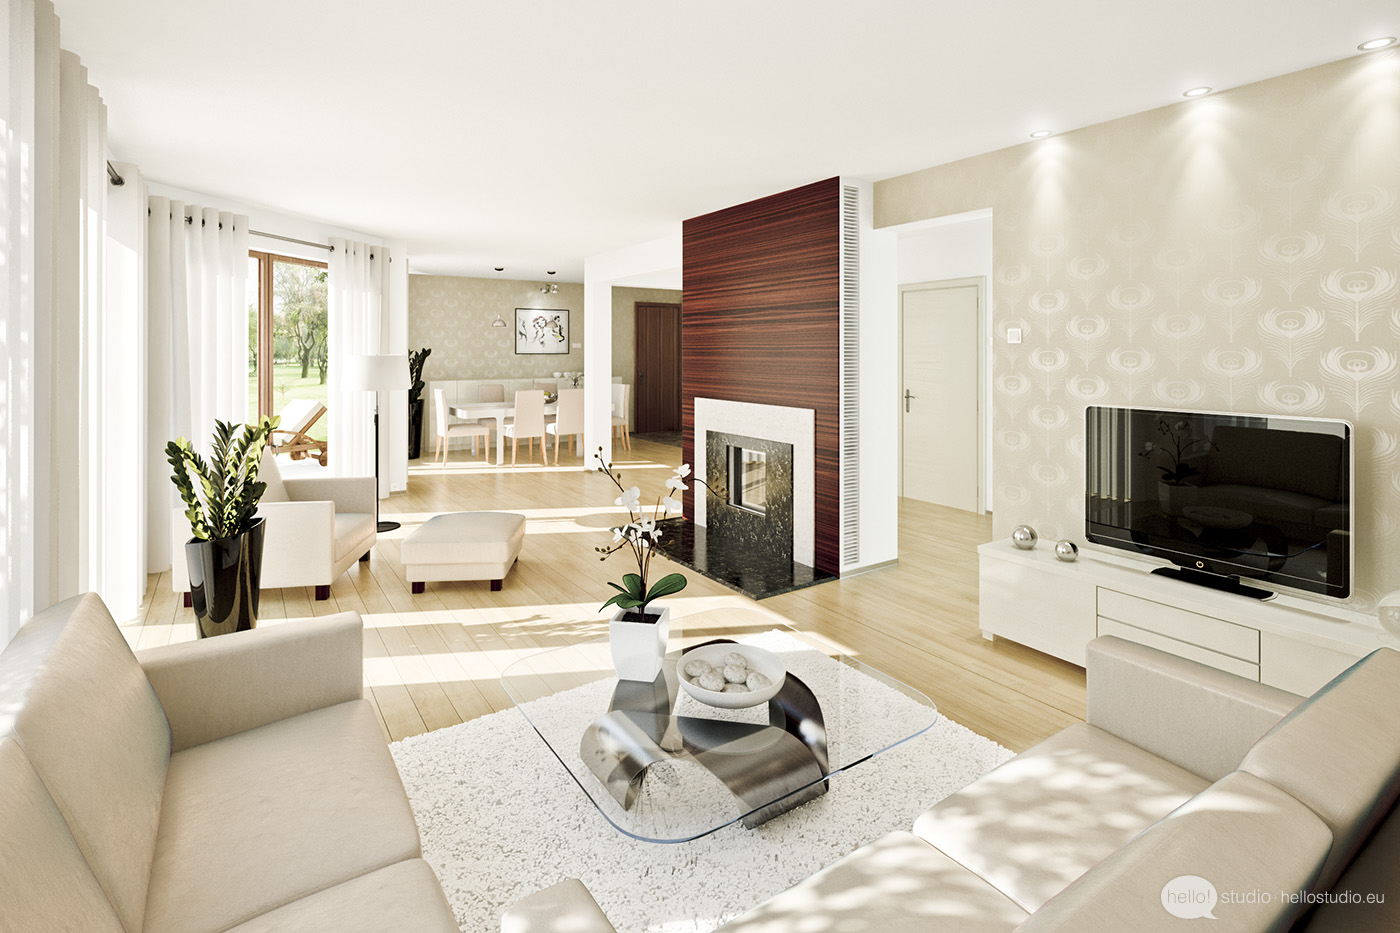 Fotos de salas decoradas : salas decoradas grandes from www.dicasdecoracao.com size 1400 x 933 jpeg 288kB